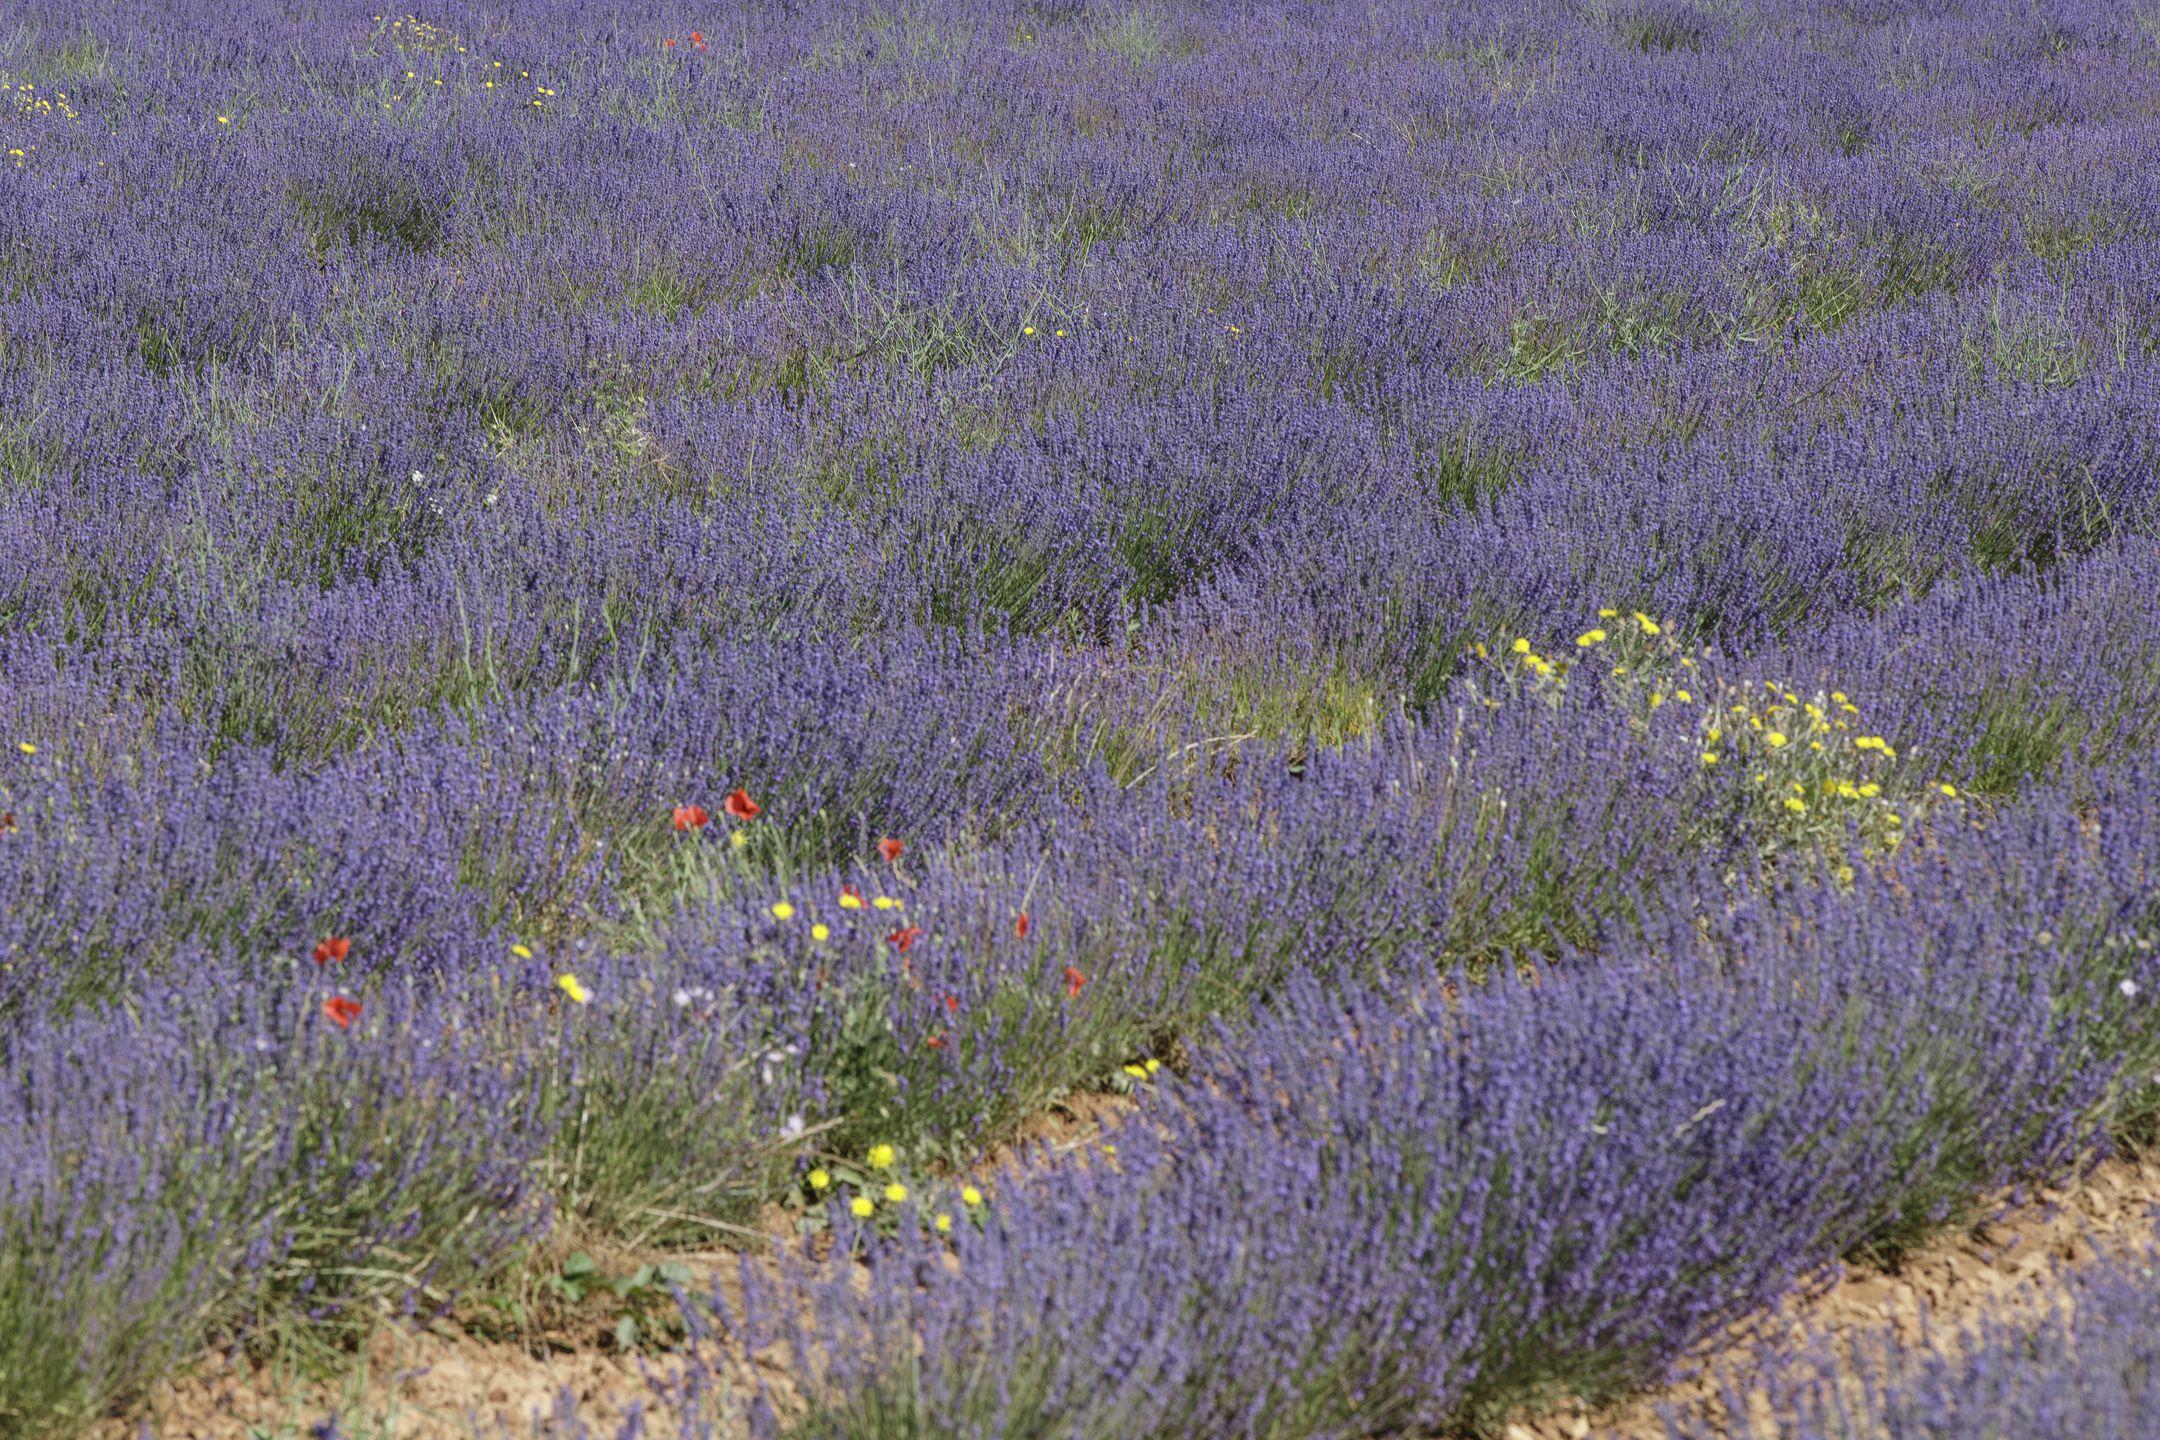 20210630-Provence-09-43-21-007